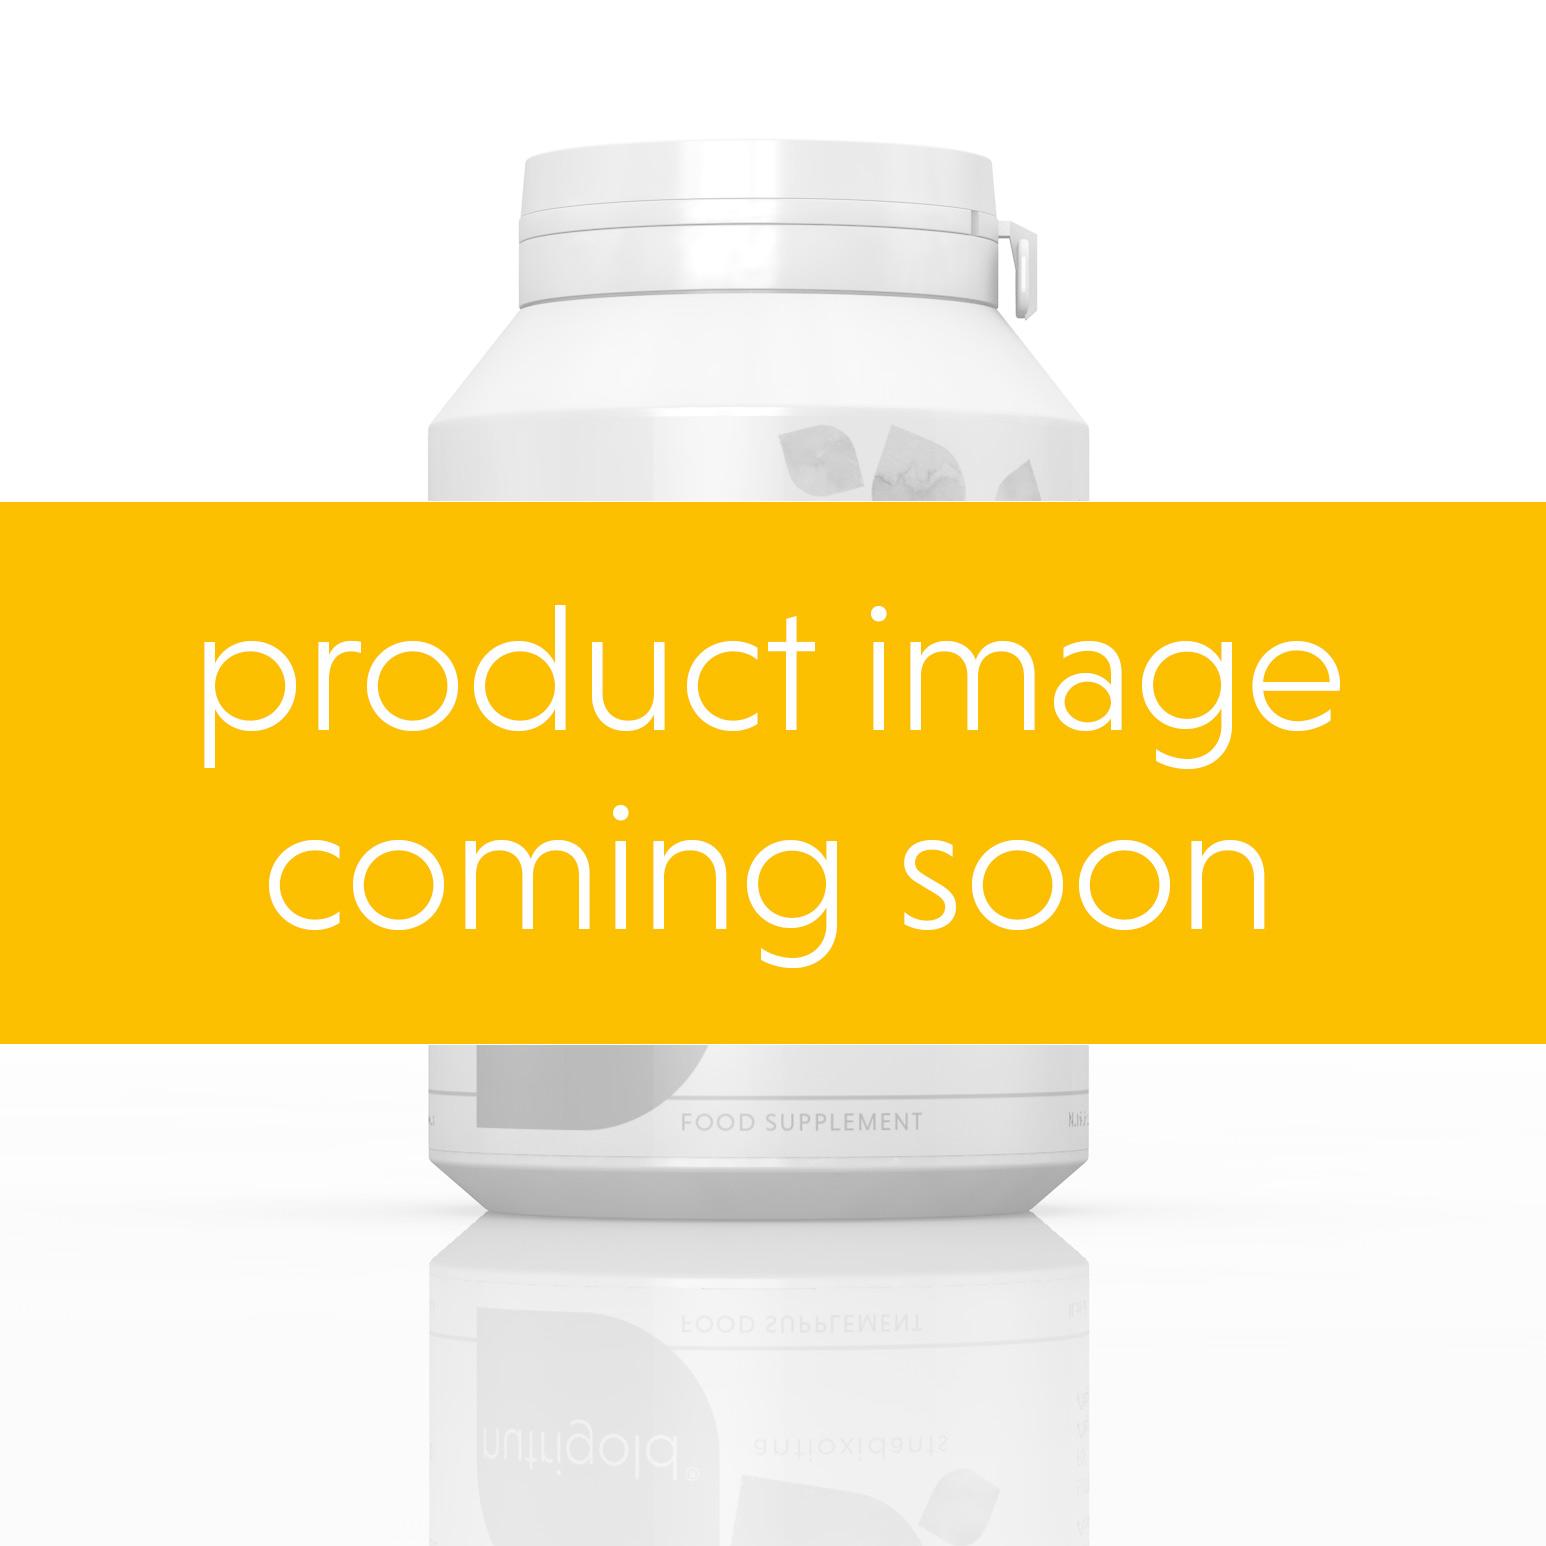 WEBINAR: Oregano Oil (Detox Kits) - 9th July 2019 @ 12pm